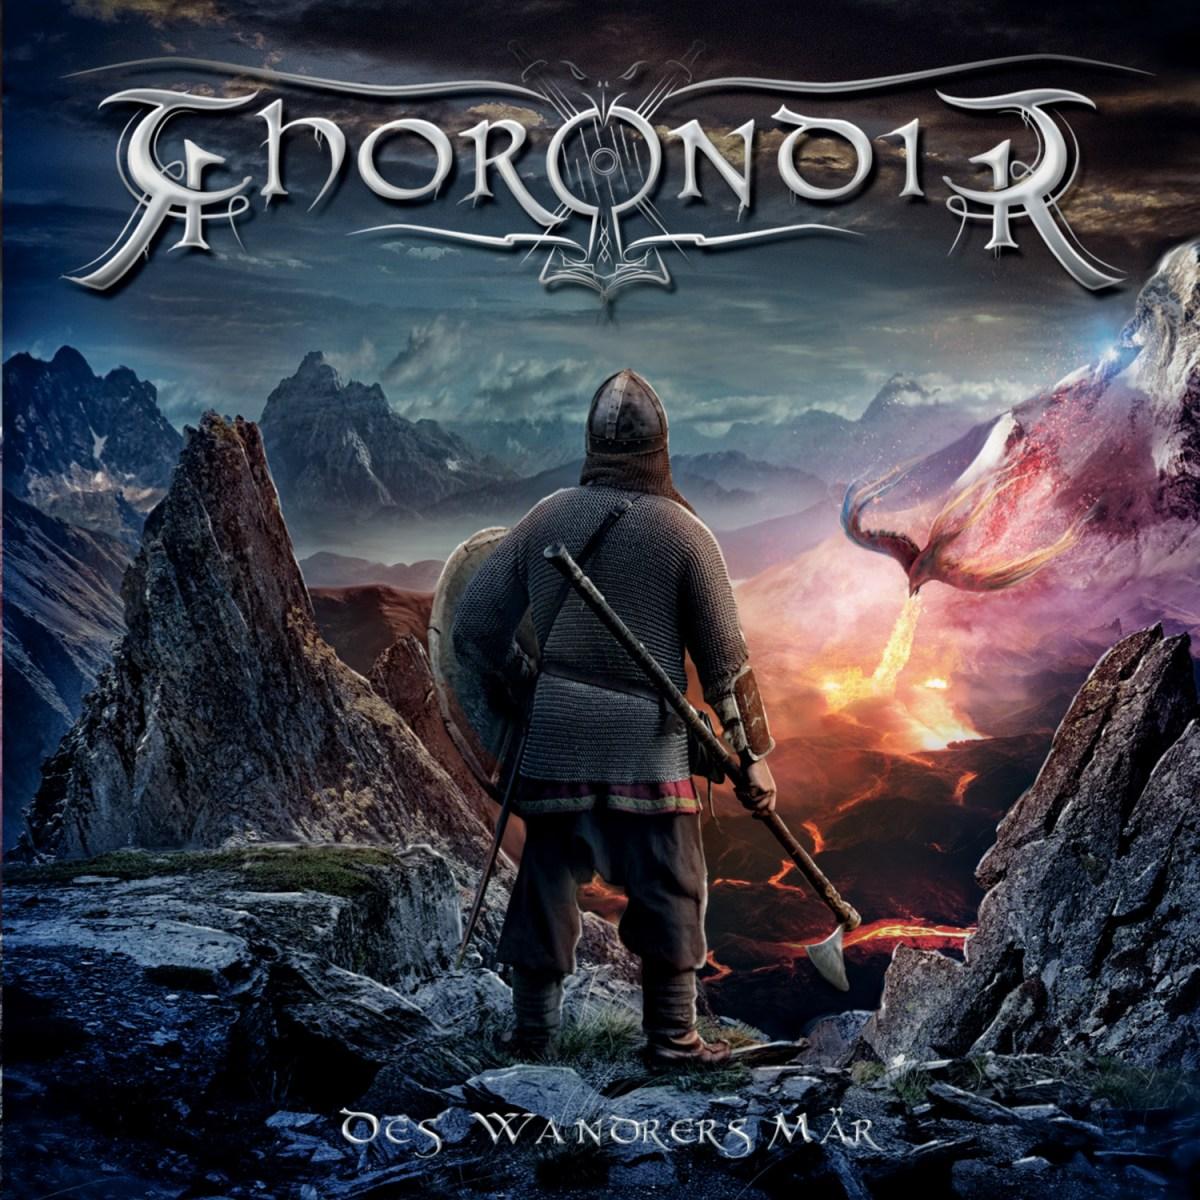 CD-Cover Thorondir - Des Wandrers Mär